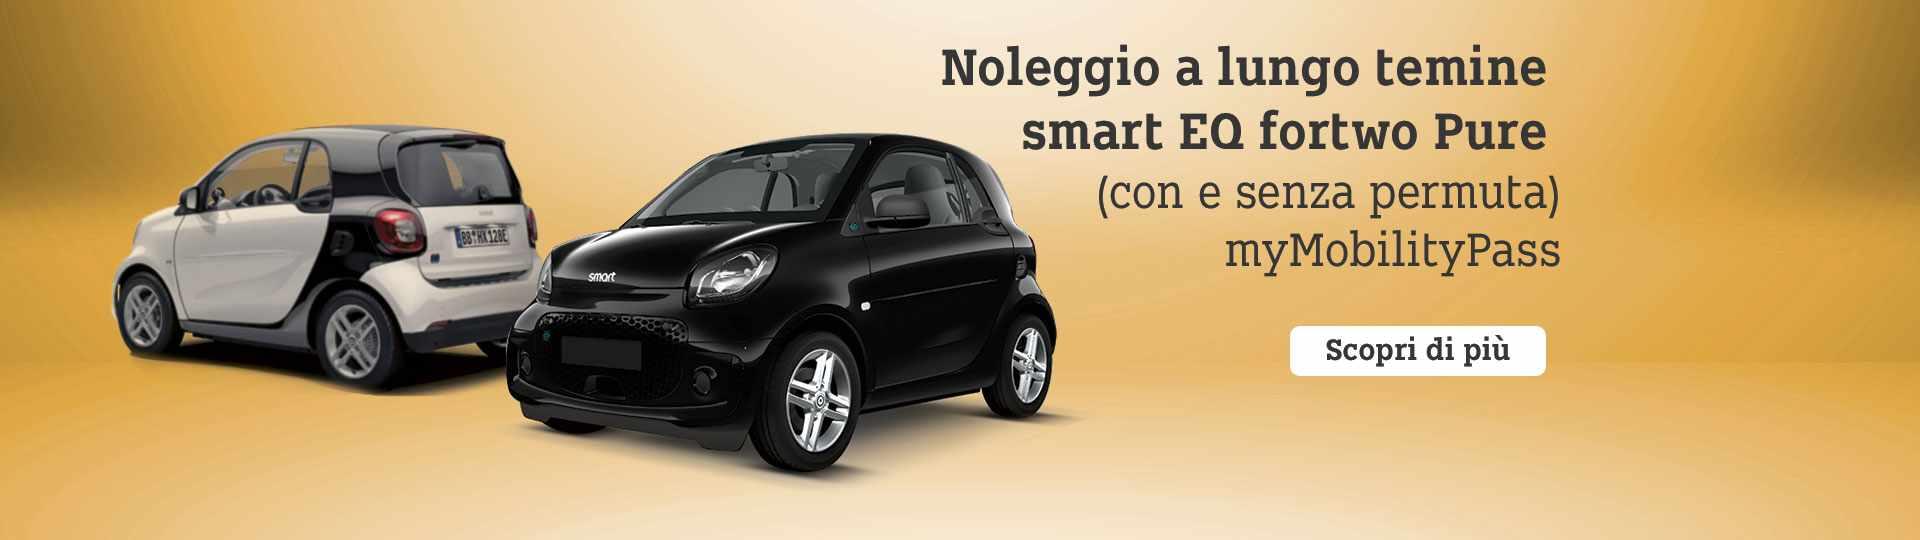 header_smart_noleggio_gennaio_2021.jpg